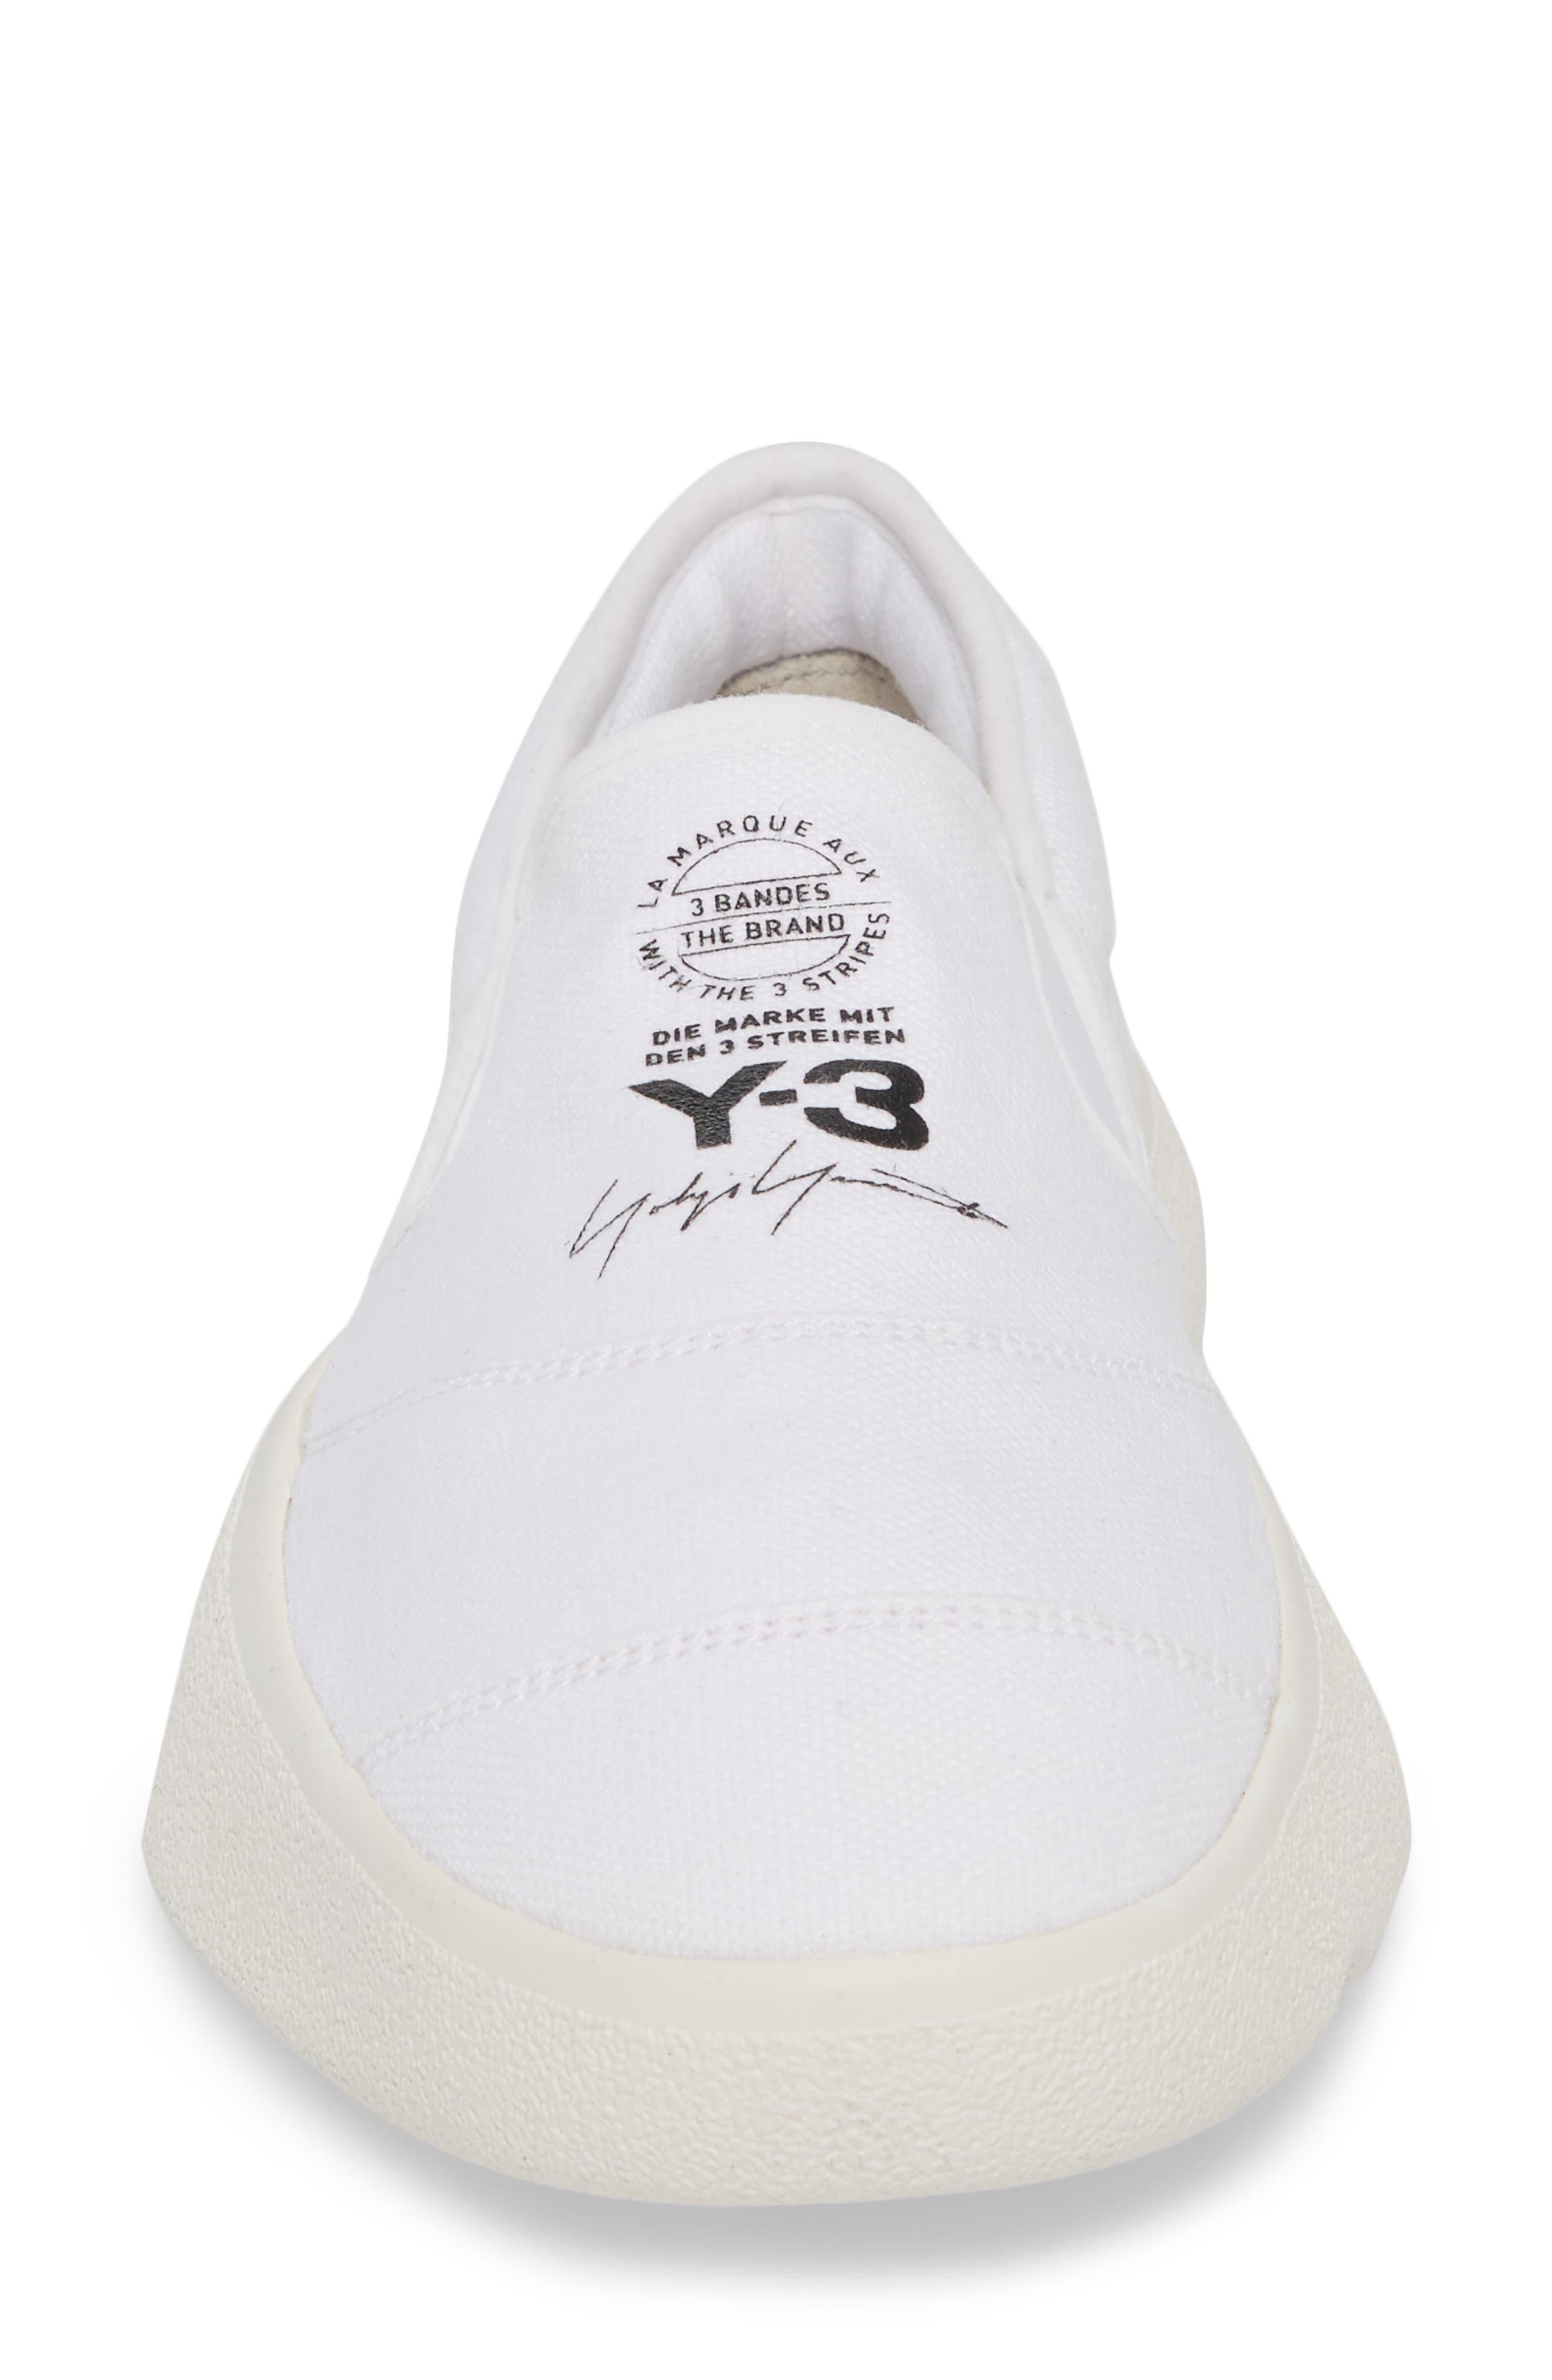 Tangutsu Slip-On Sneaker,                             Alternate thumbnail 4, color,                             White / Black / Core White